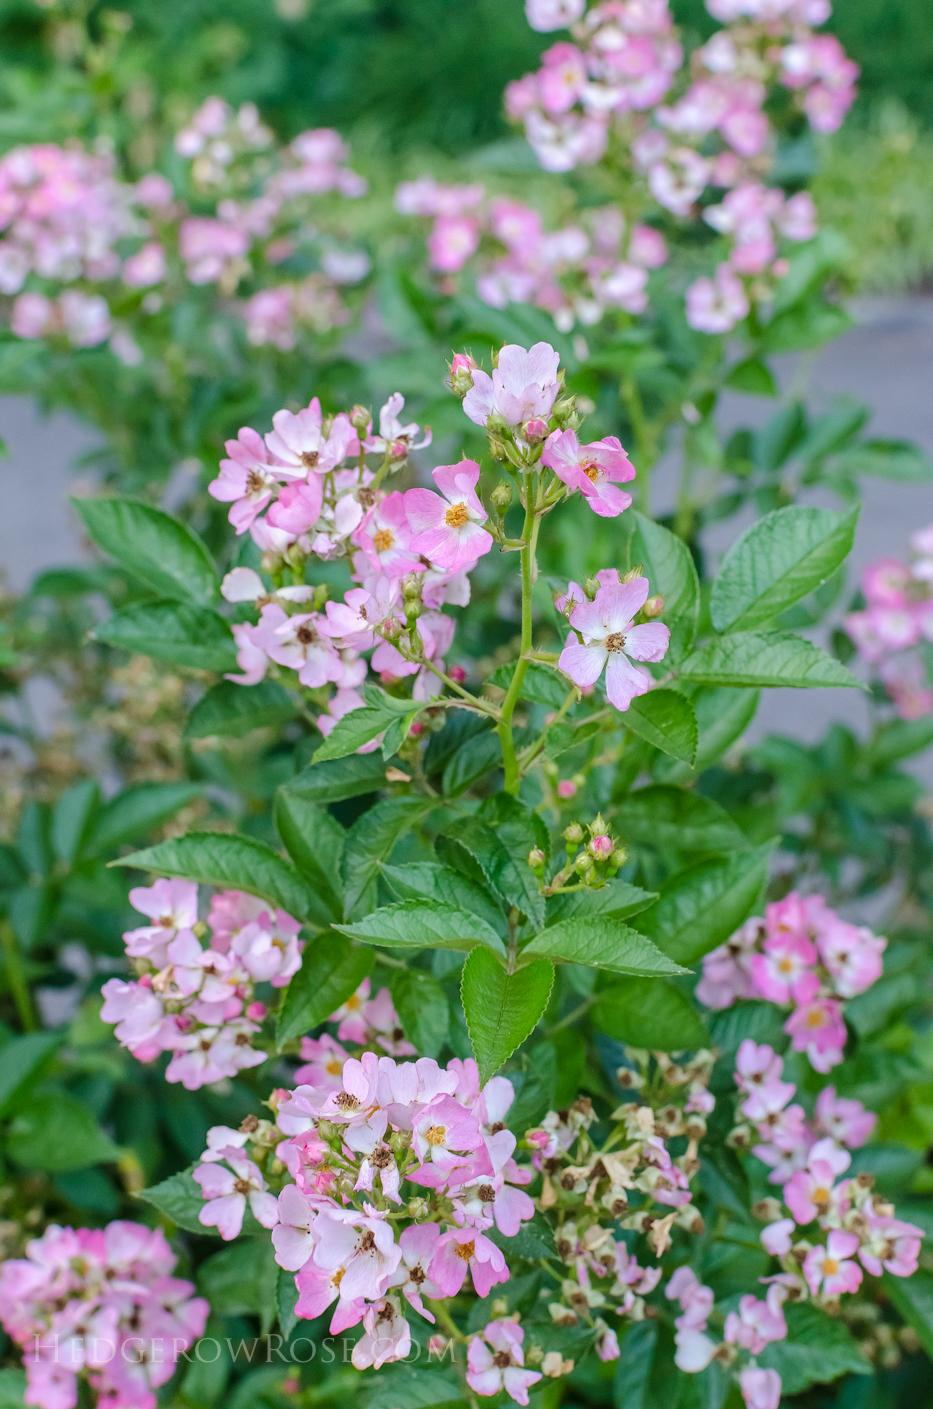 Biltmore Rose Gardens via Hedgerow Rose - Phloxy Baby 2